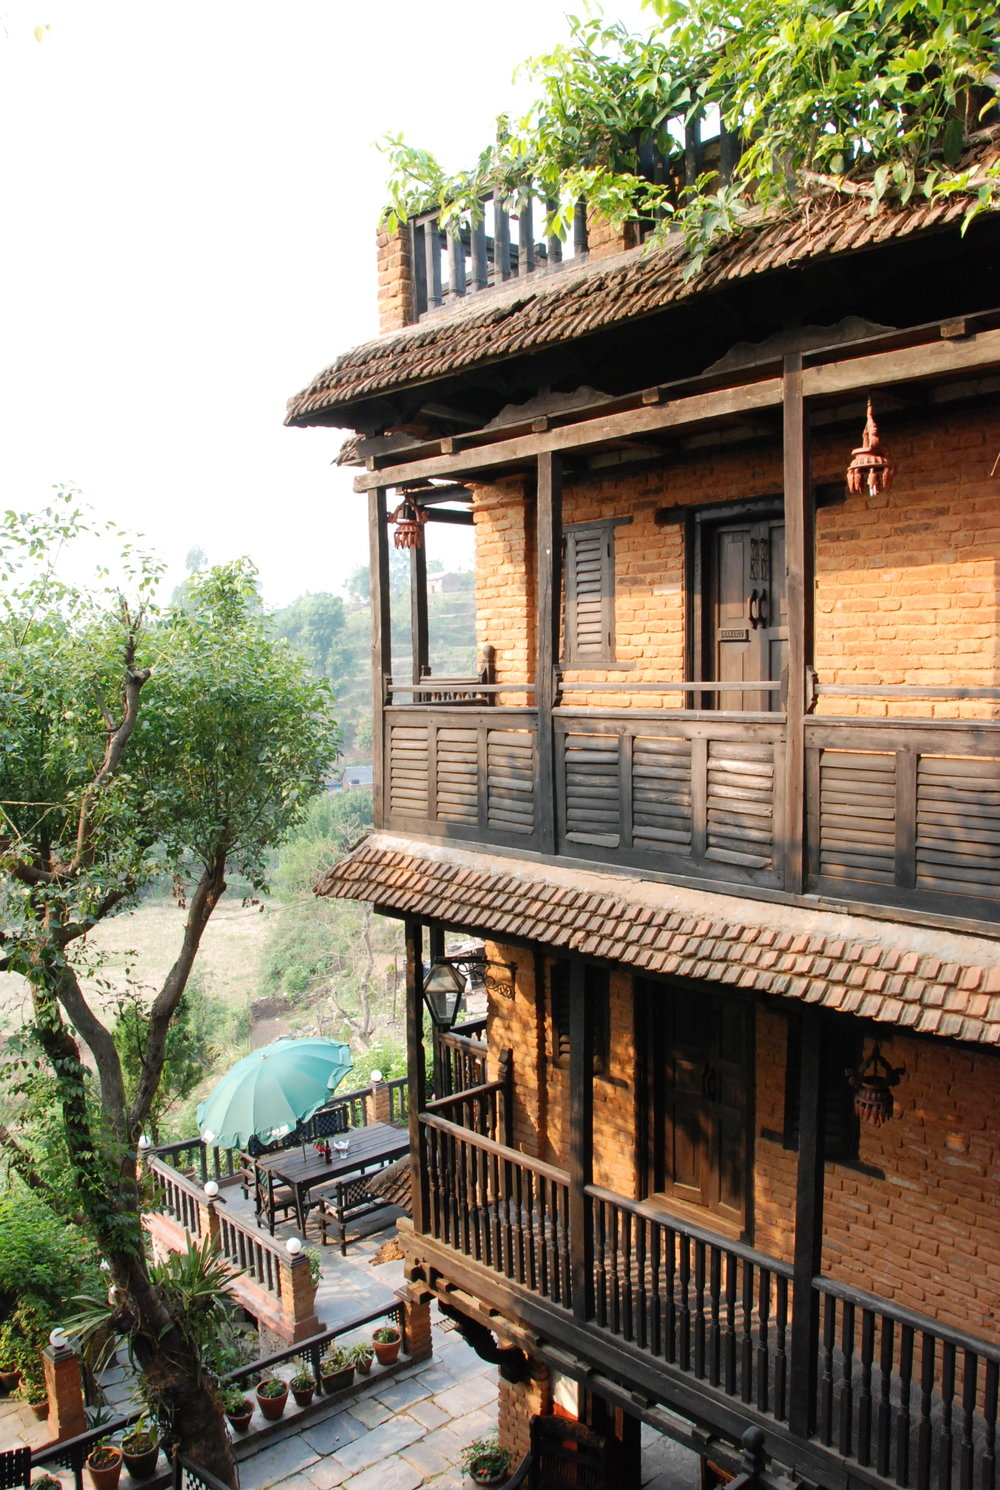 Bandipur Inn.JPG